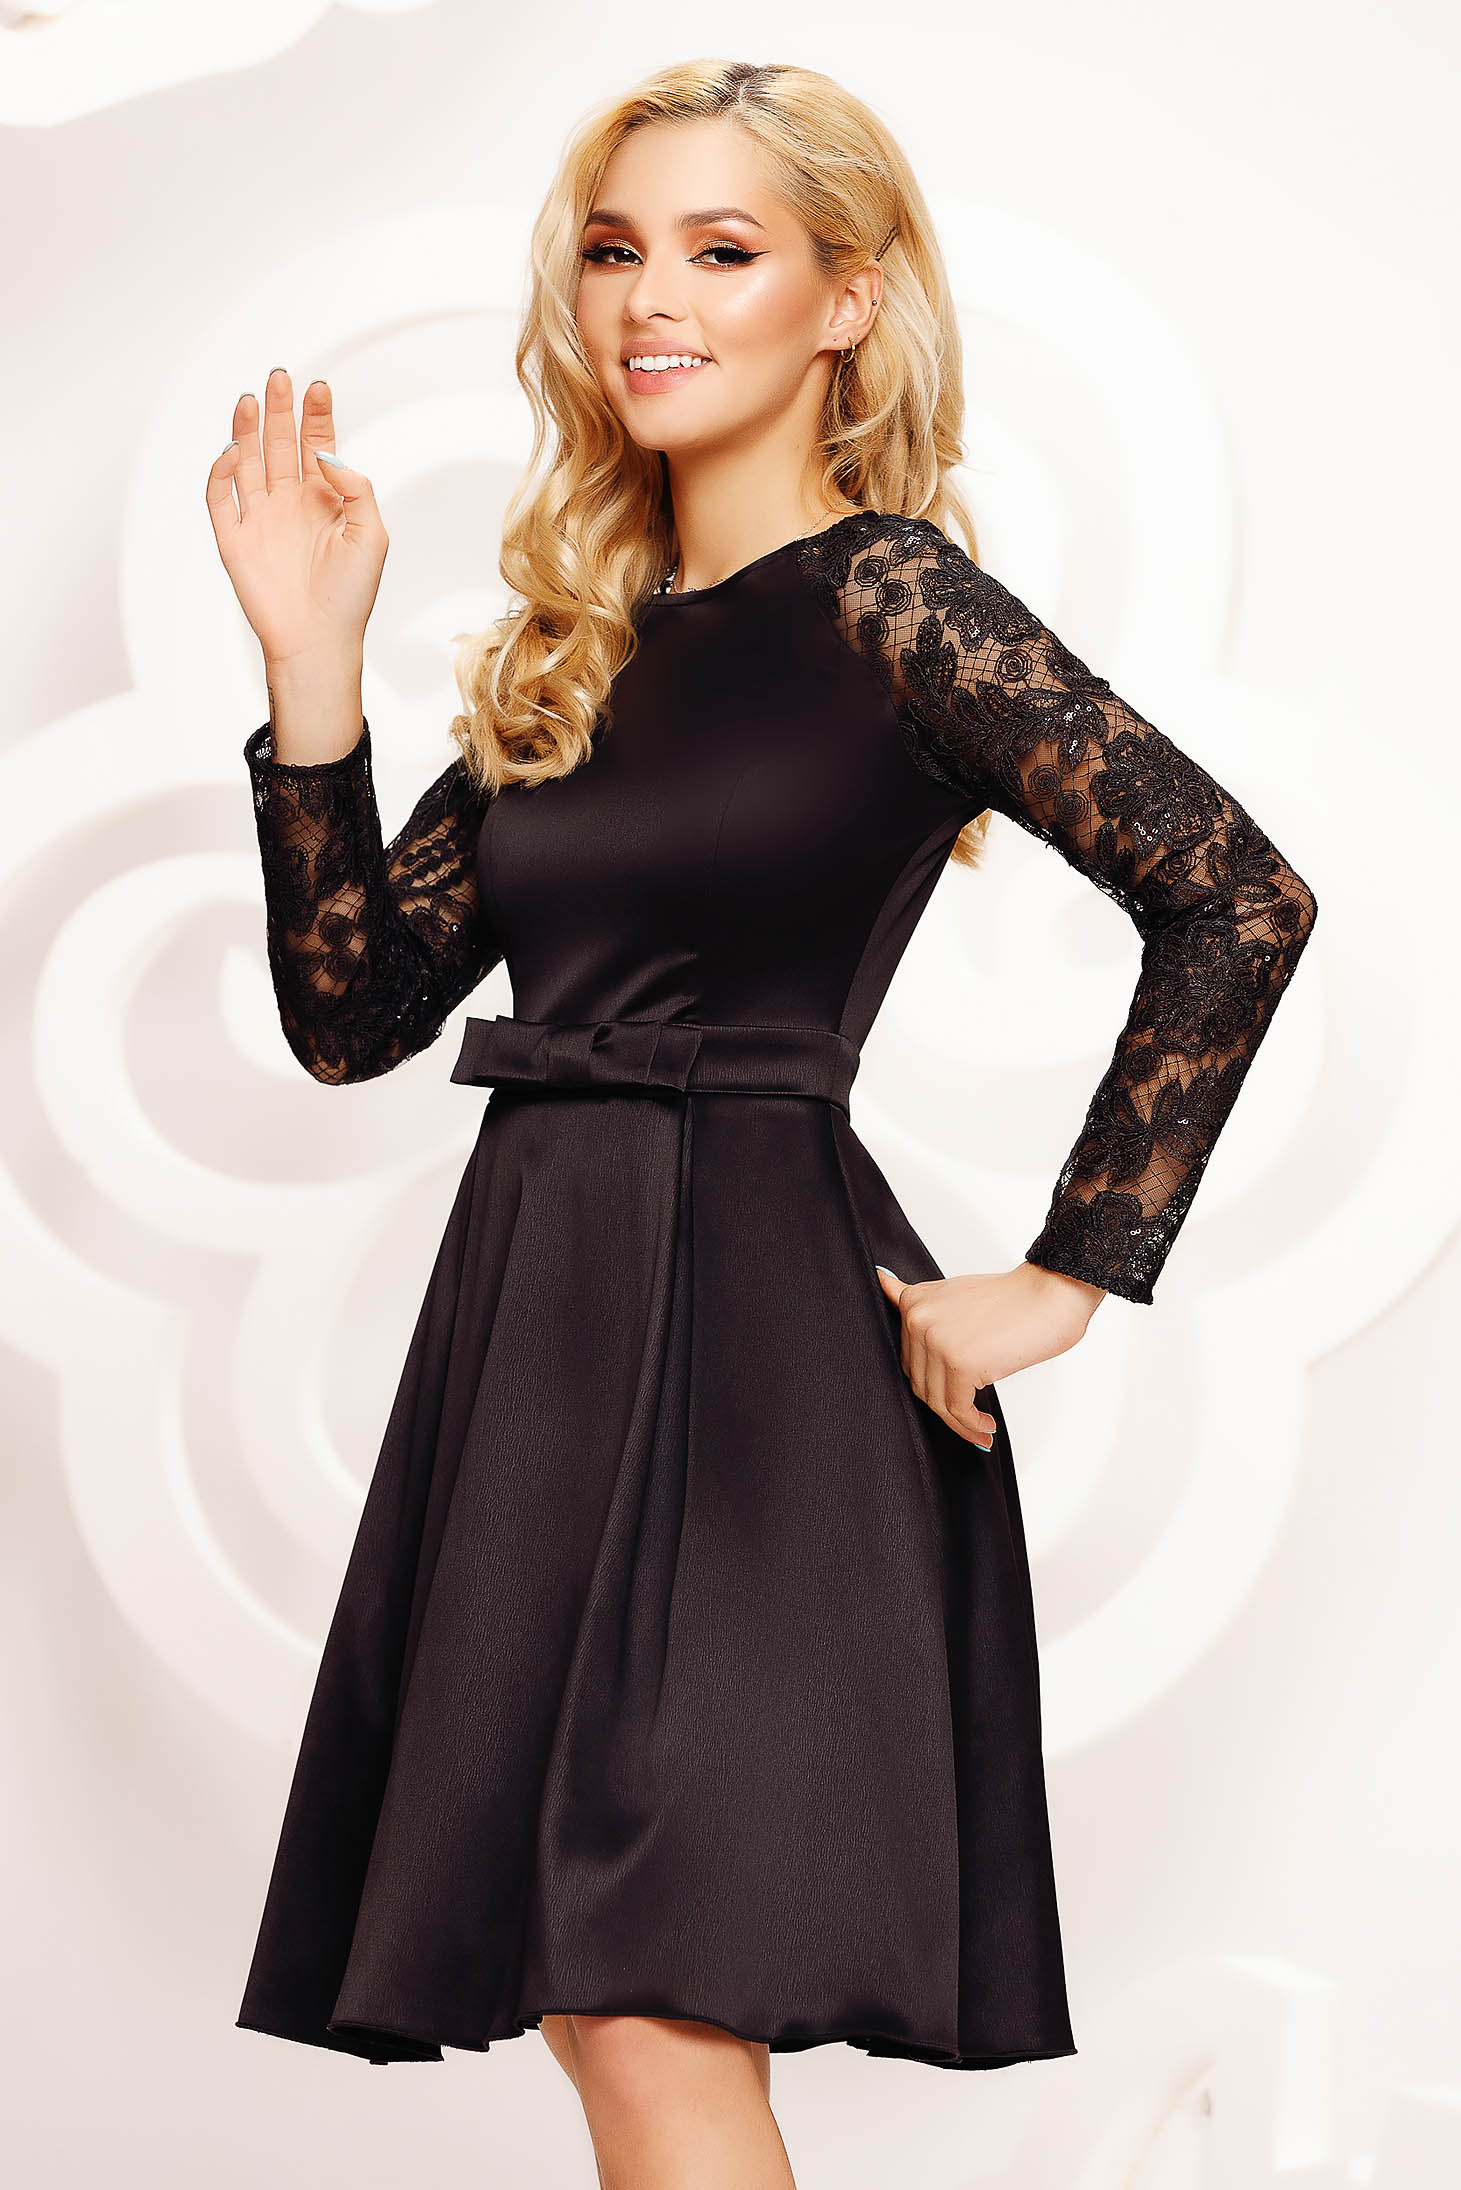 Black dress short cut cloche occasional transparent sleeves